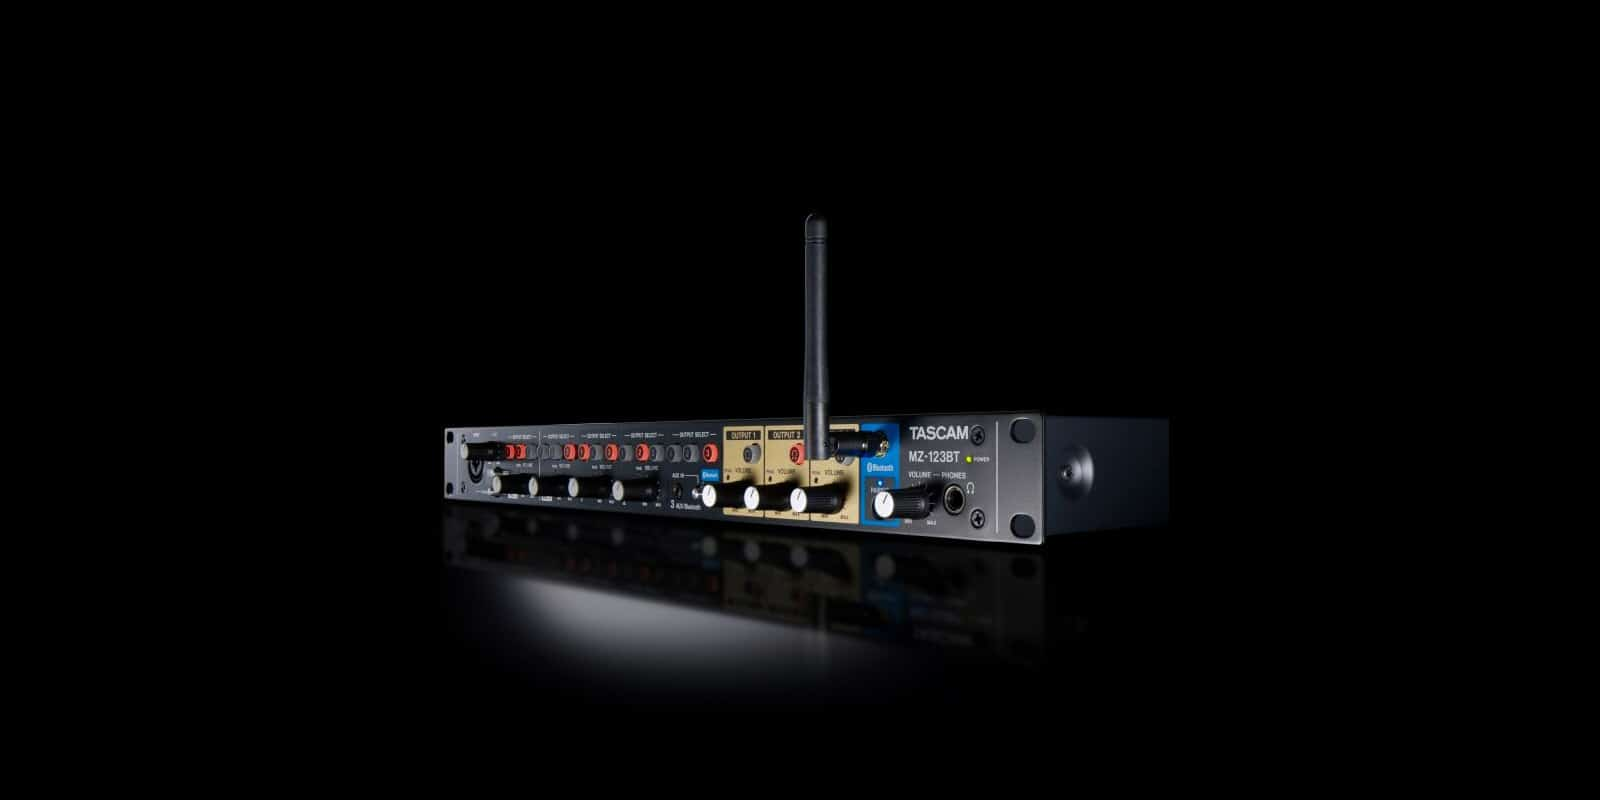 TASCAM Compact MZ-123BT Audio Mixer